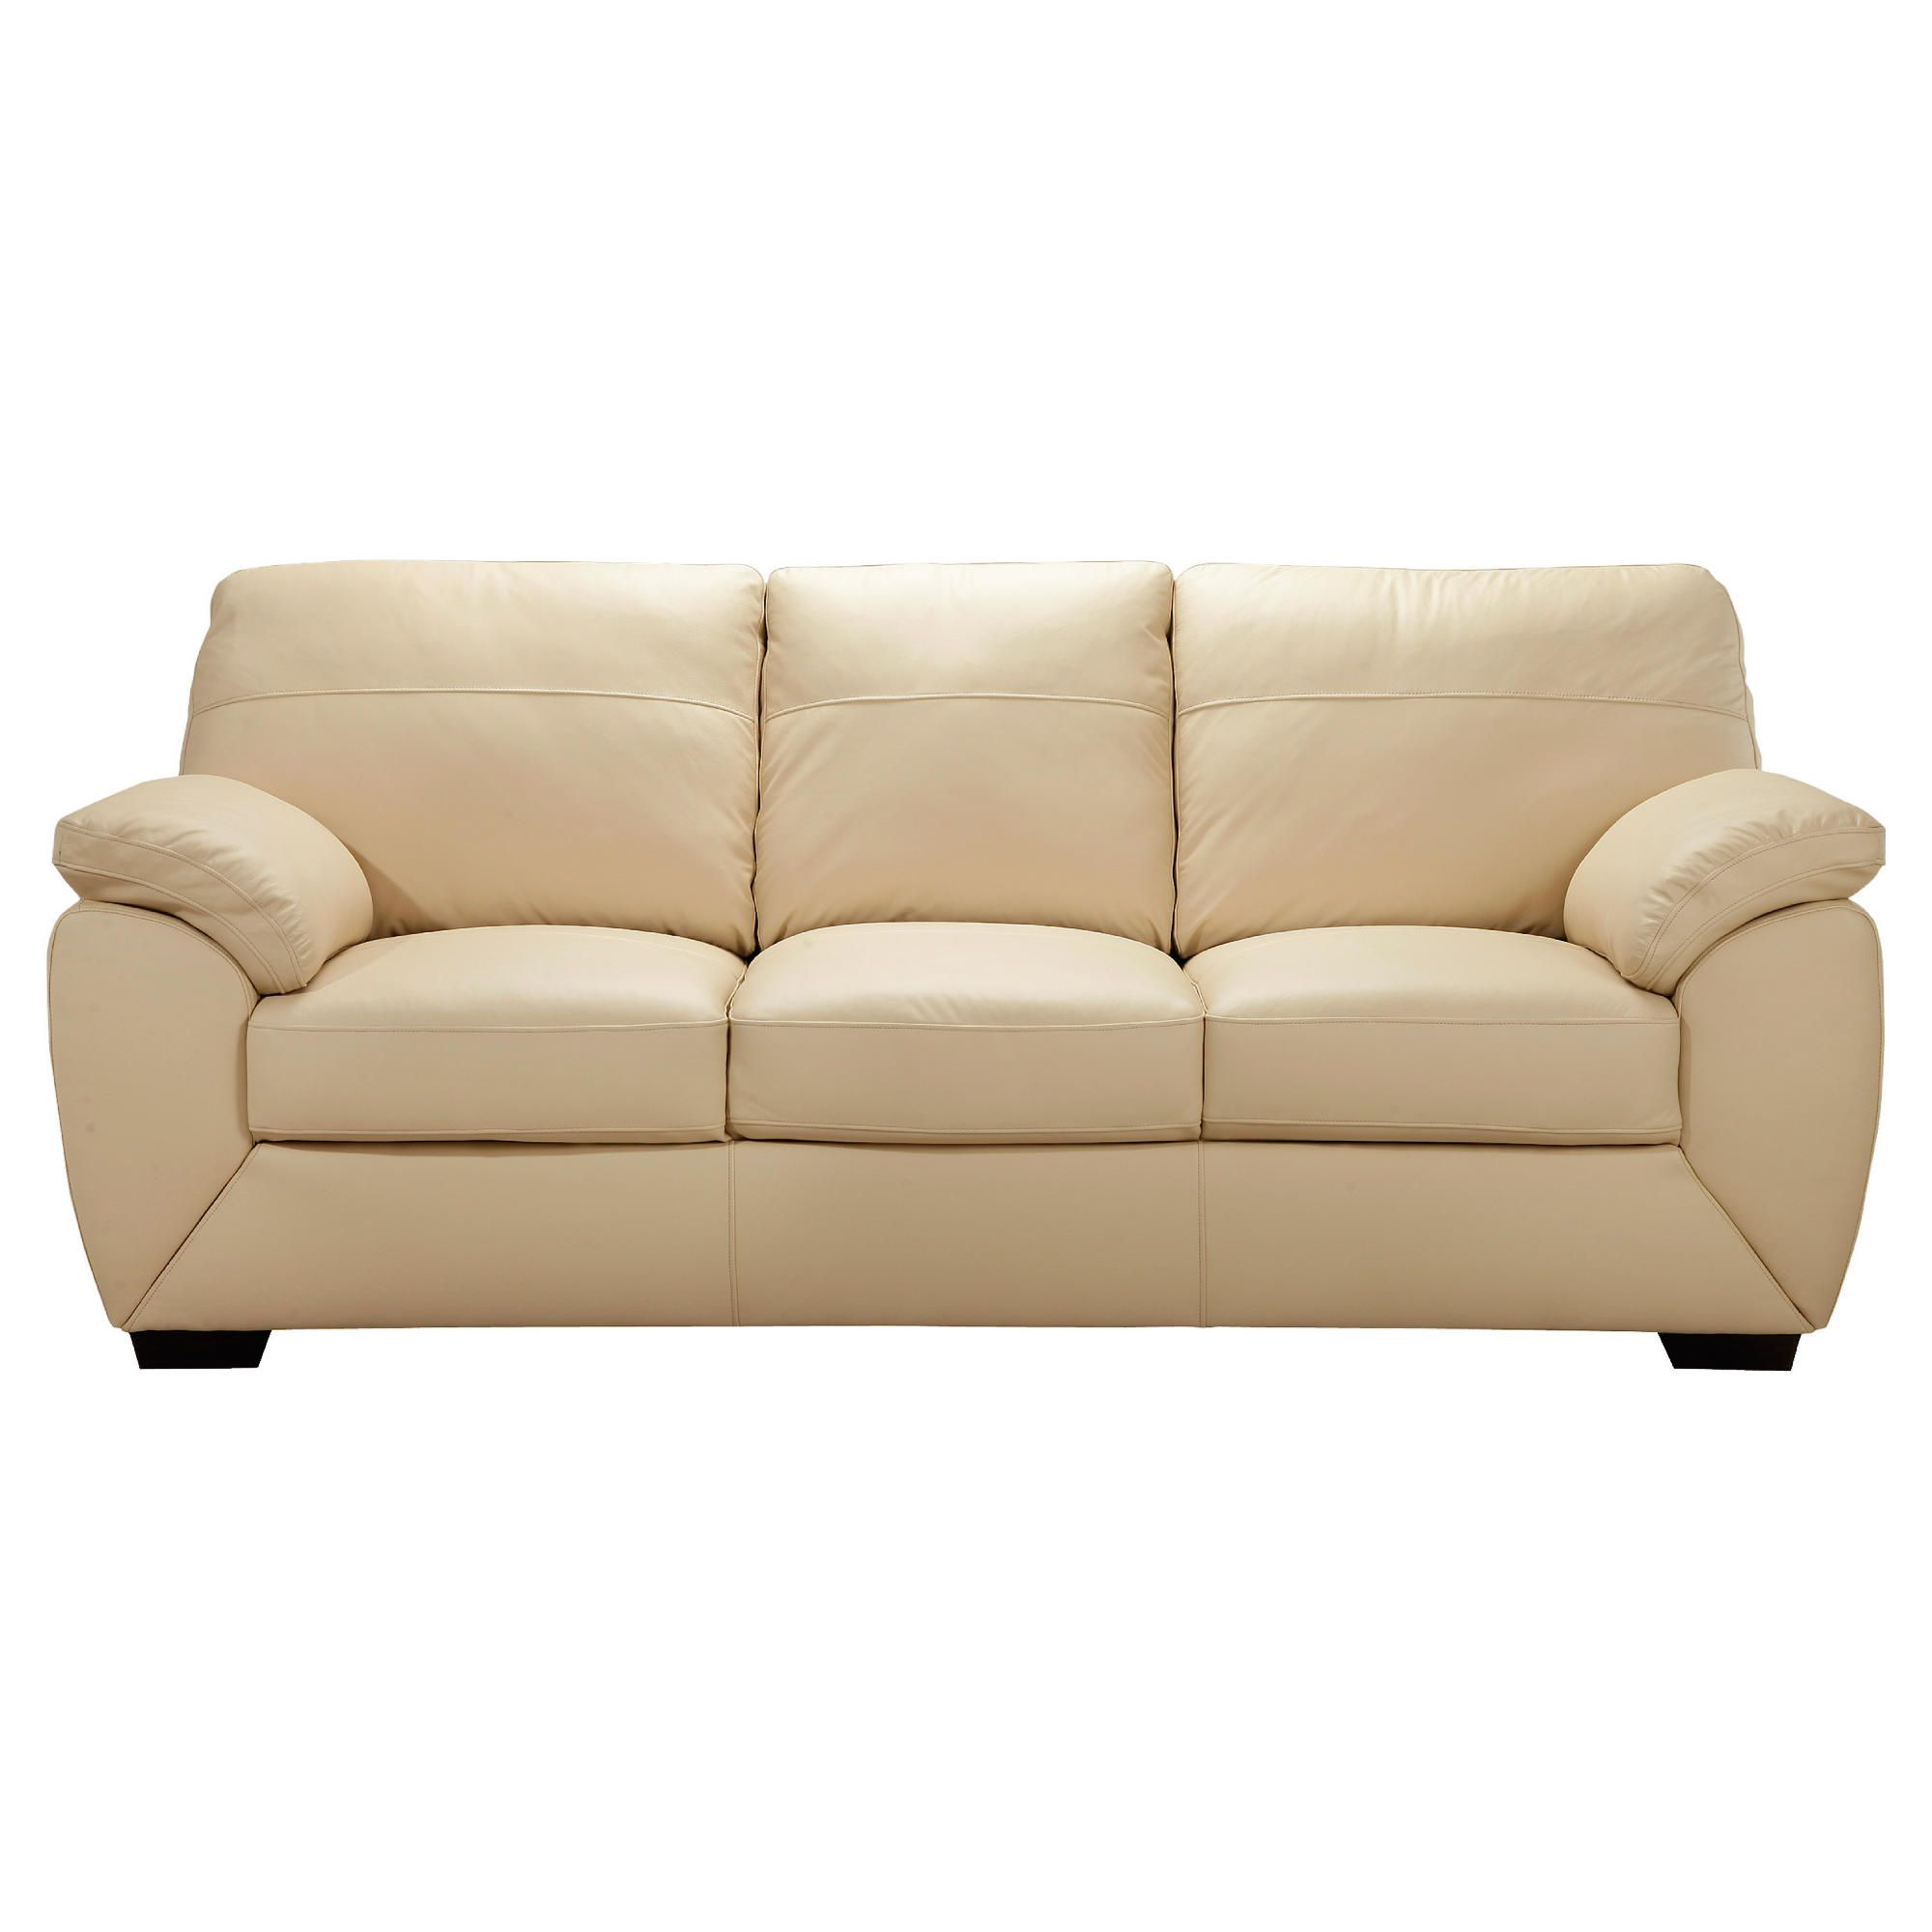 Leather Sofa Tesco Direct Infosofaco : 268 2209PITPS1564840wid2000amphei2000 from infosofa.co size 2000 x 2000 jpeg 98kB